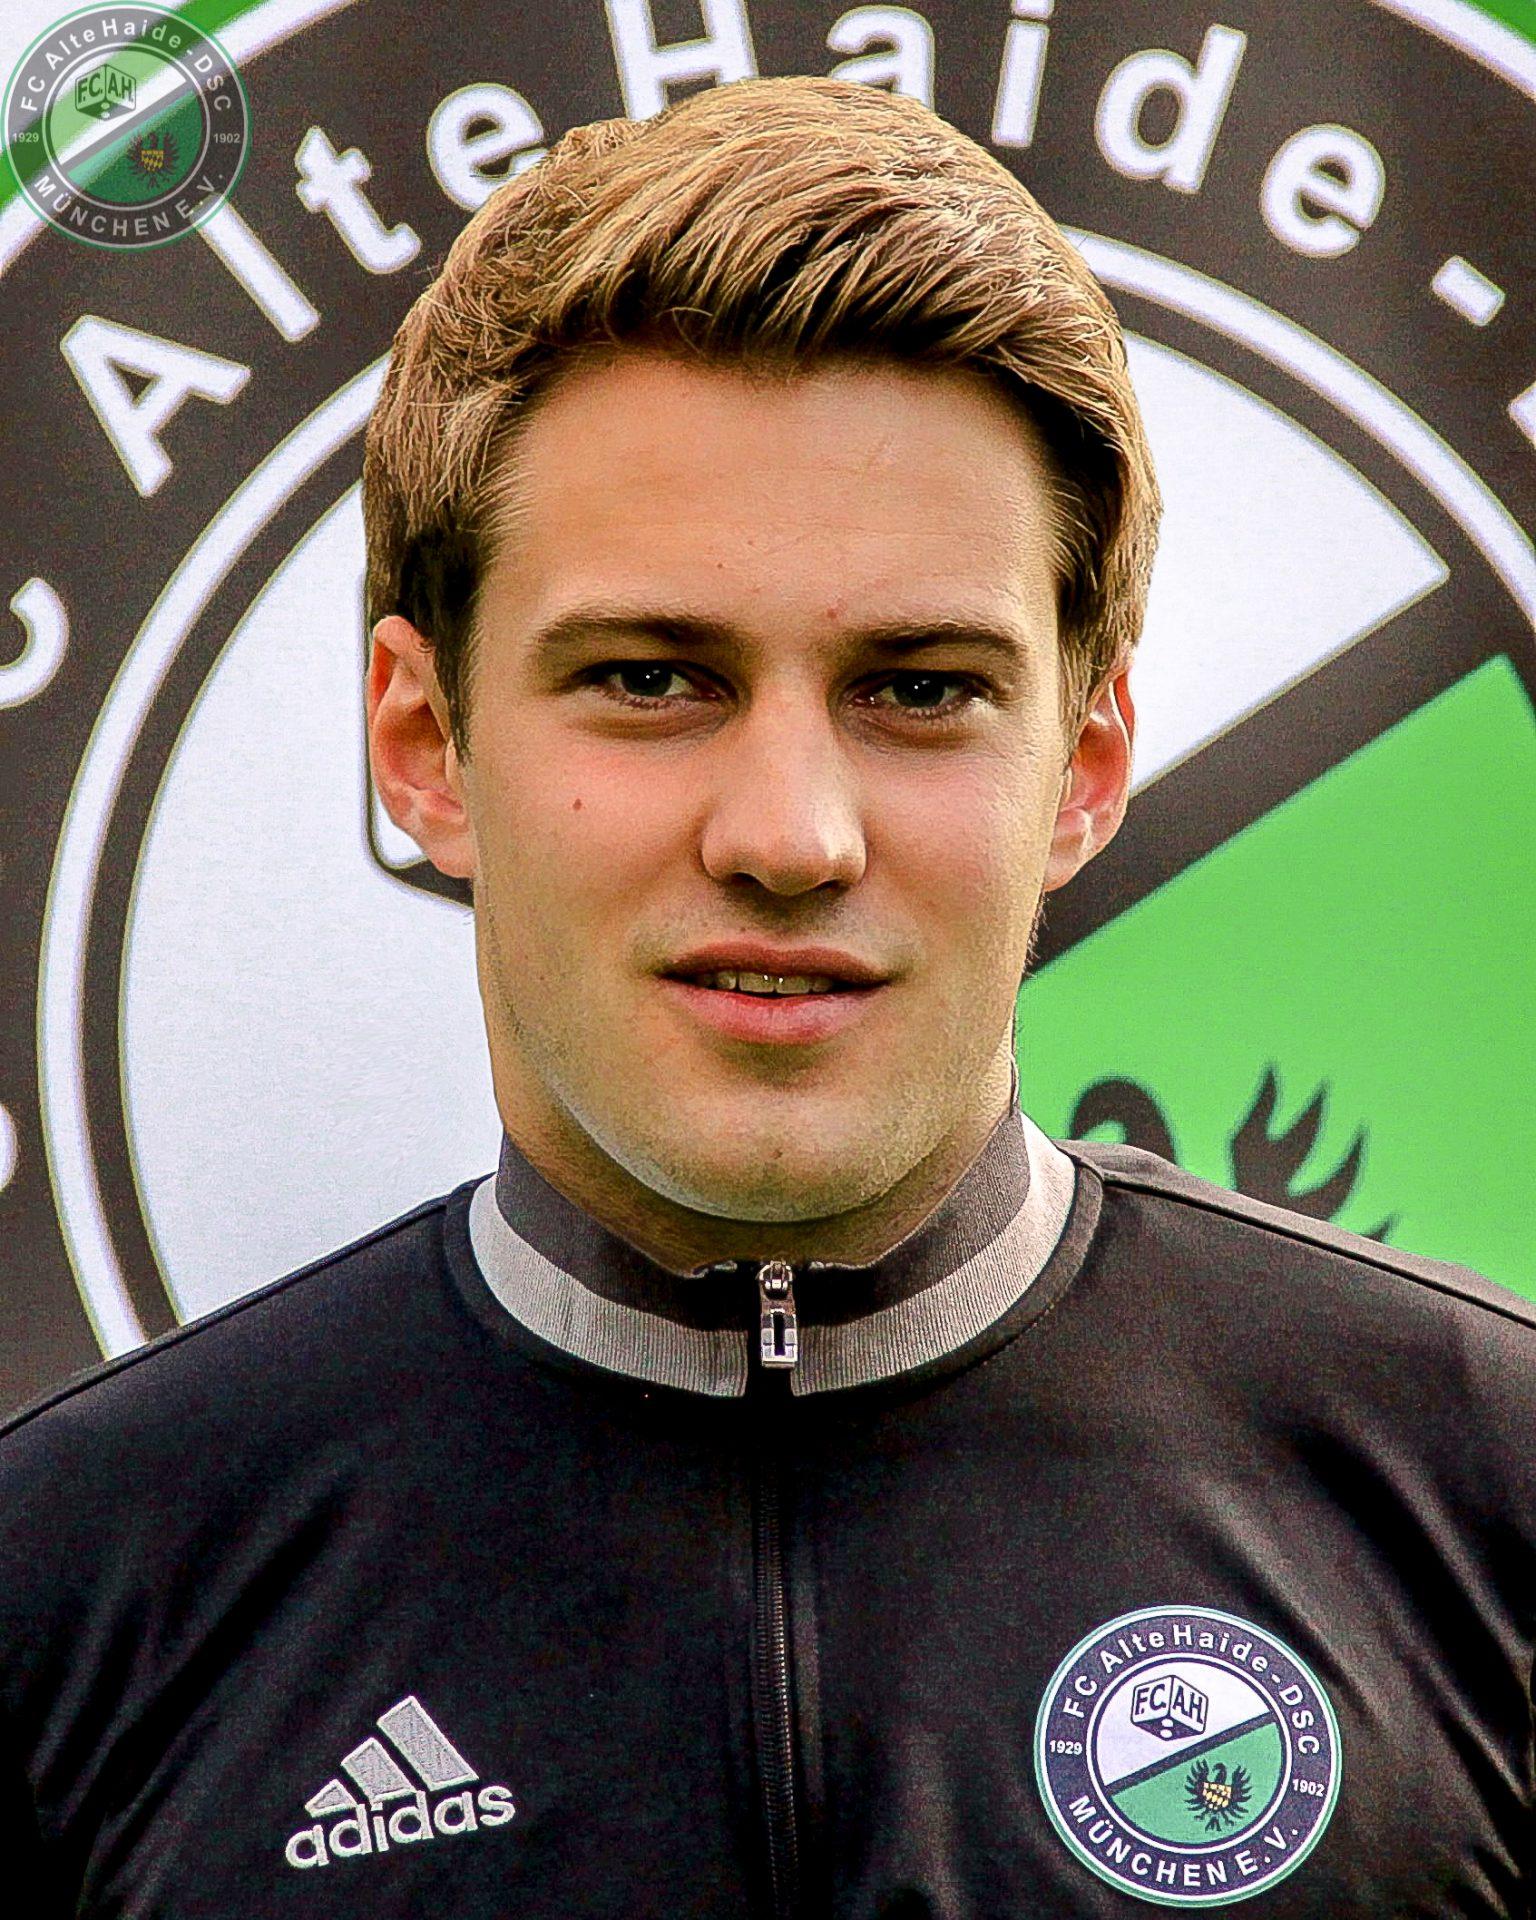 Daniel Neumeier